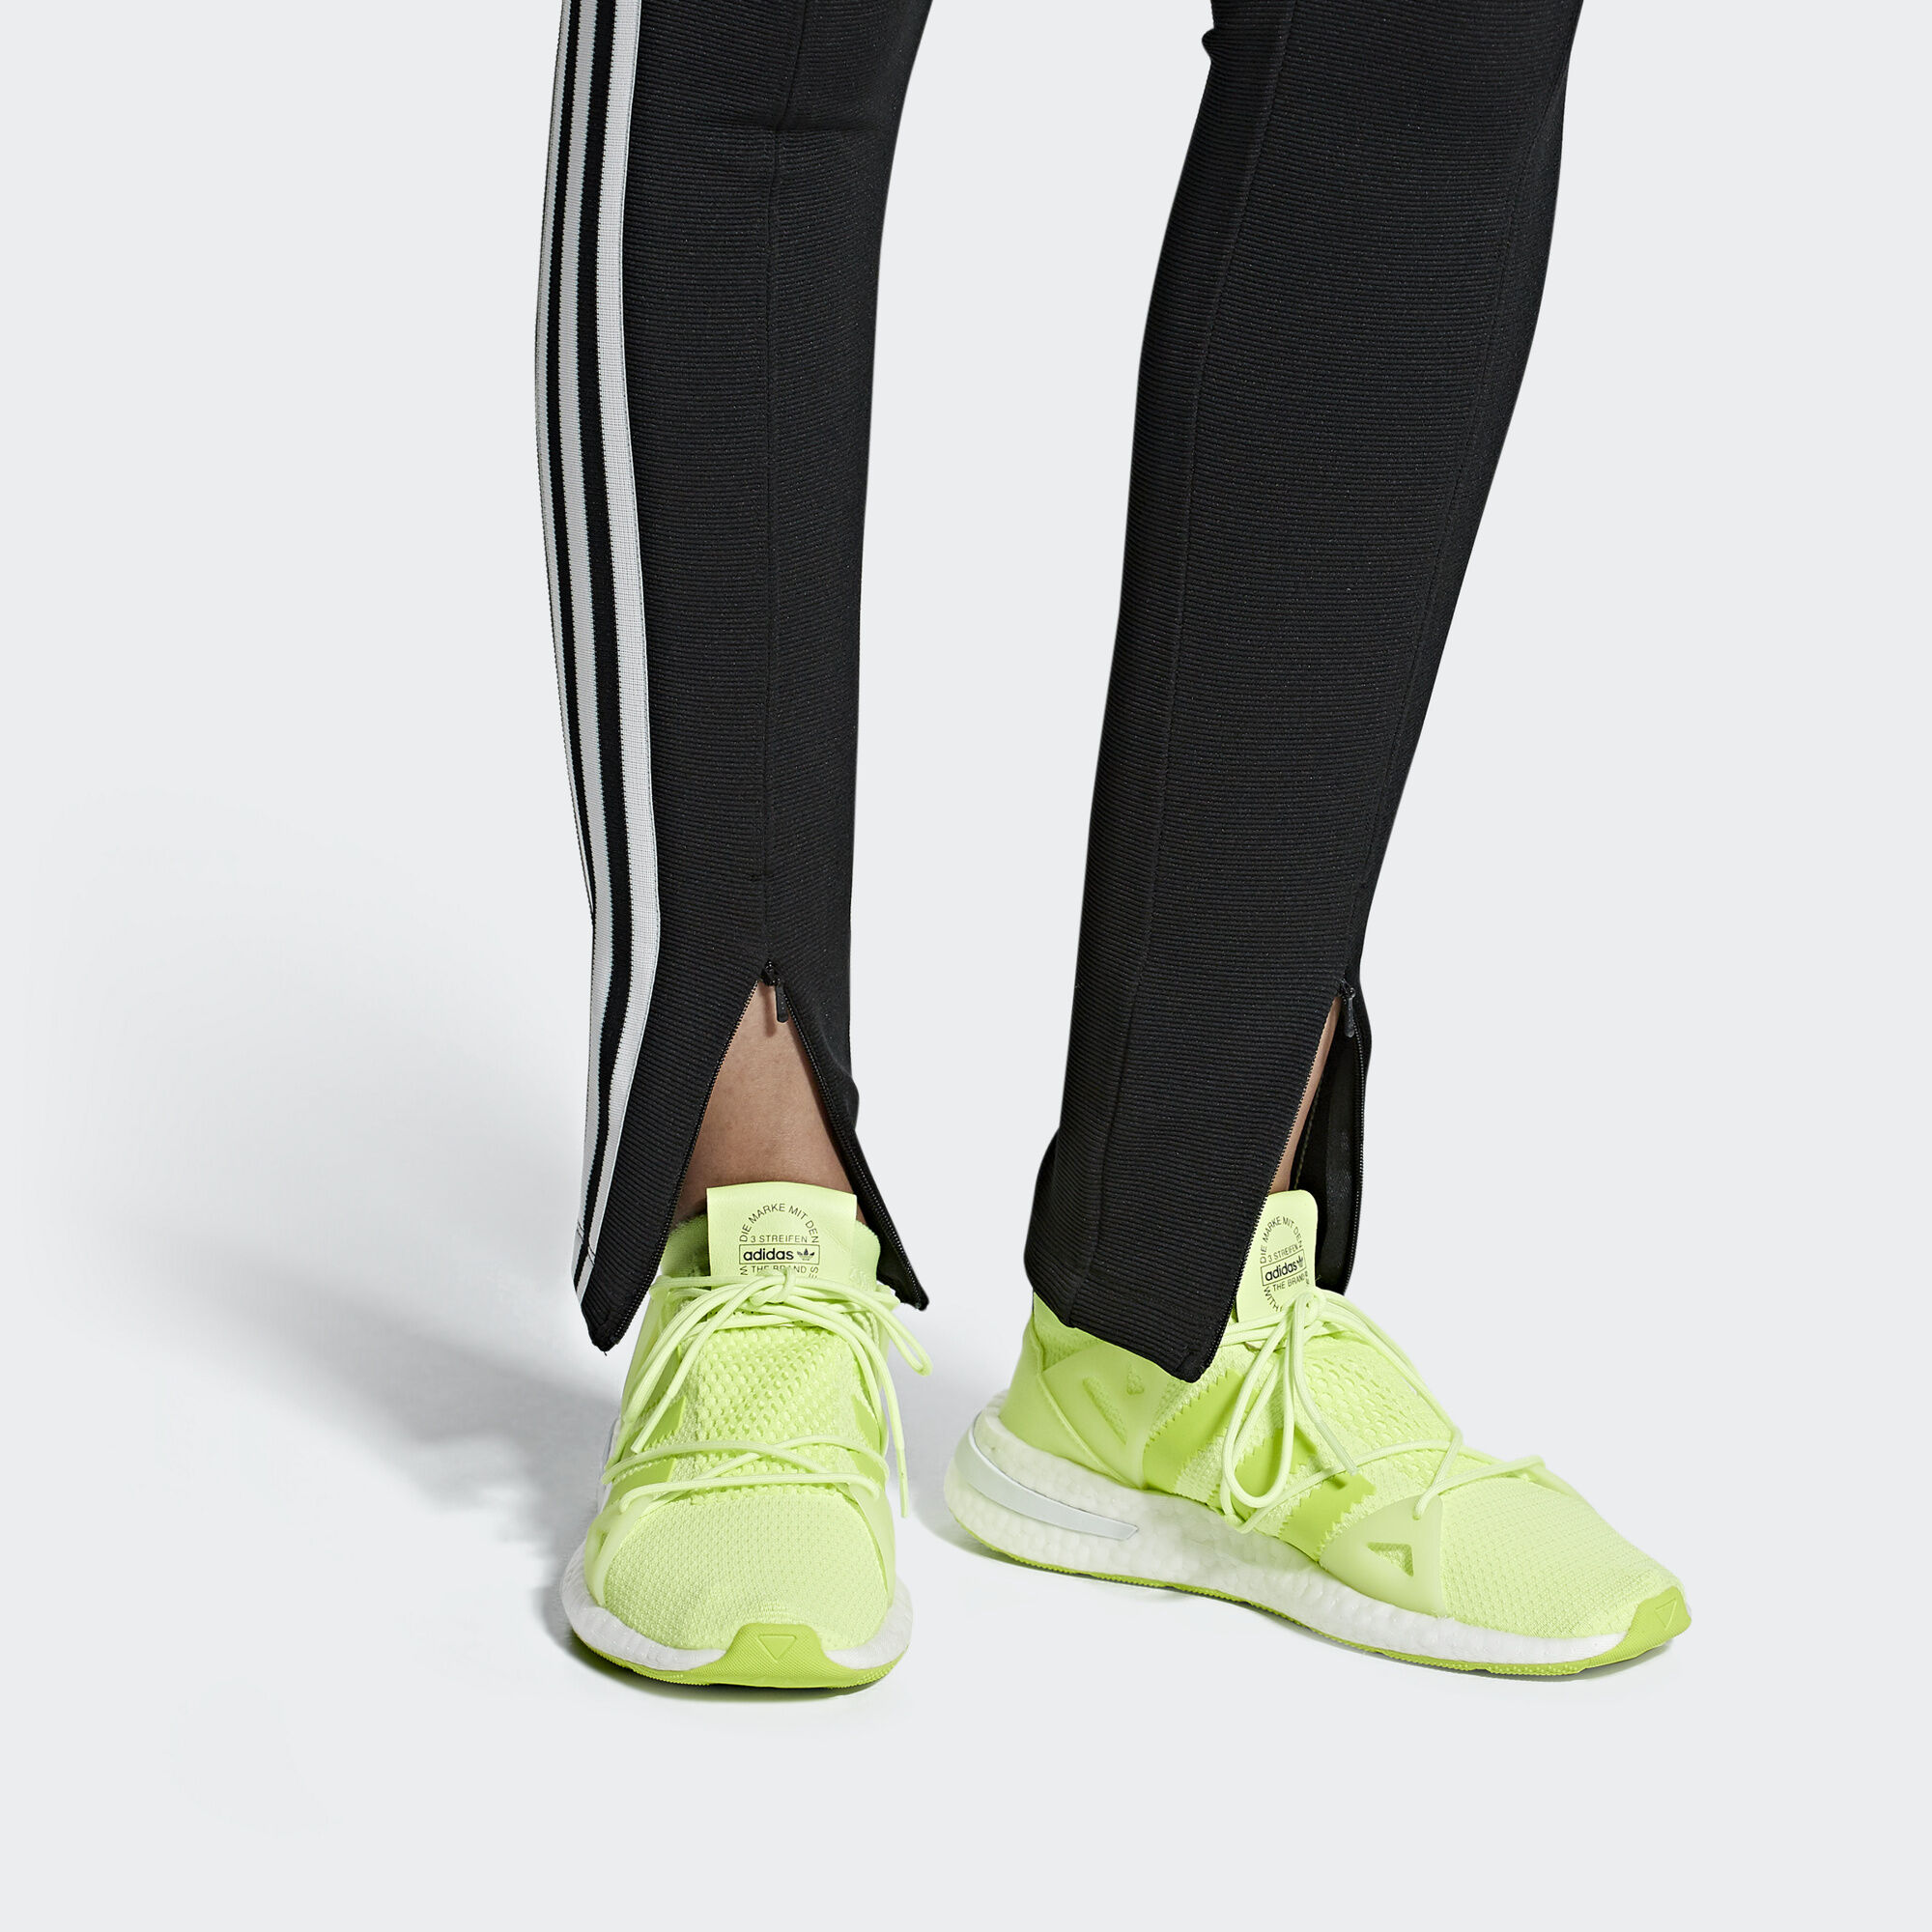 buy online 154dc 4d82c Zapatilla Arkyn - Turquesa adidas  adidas España